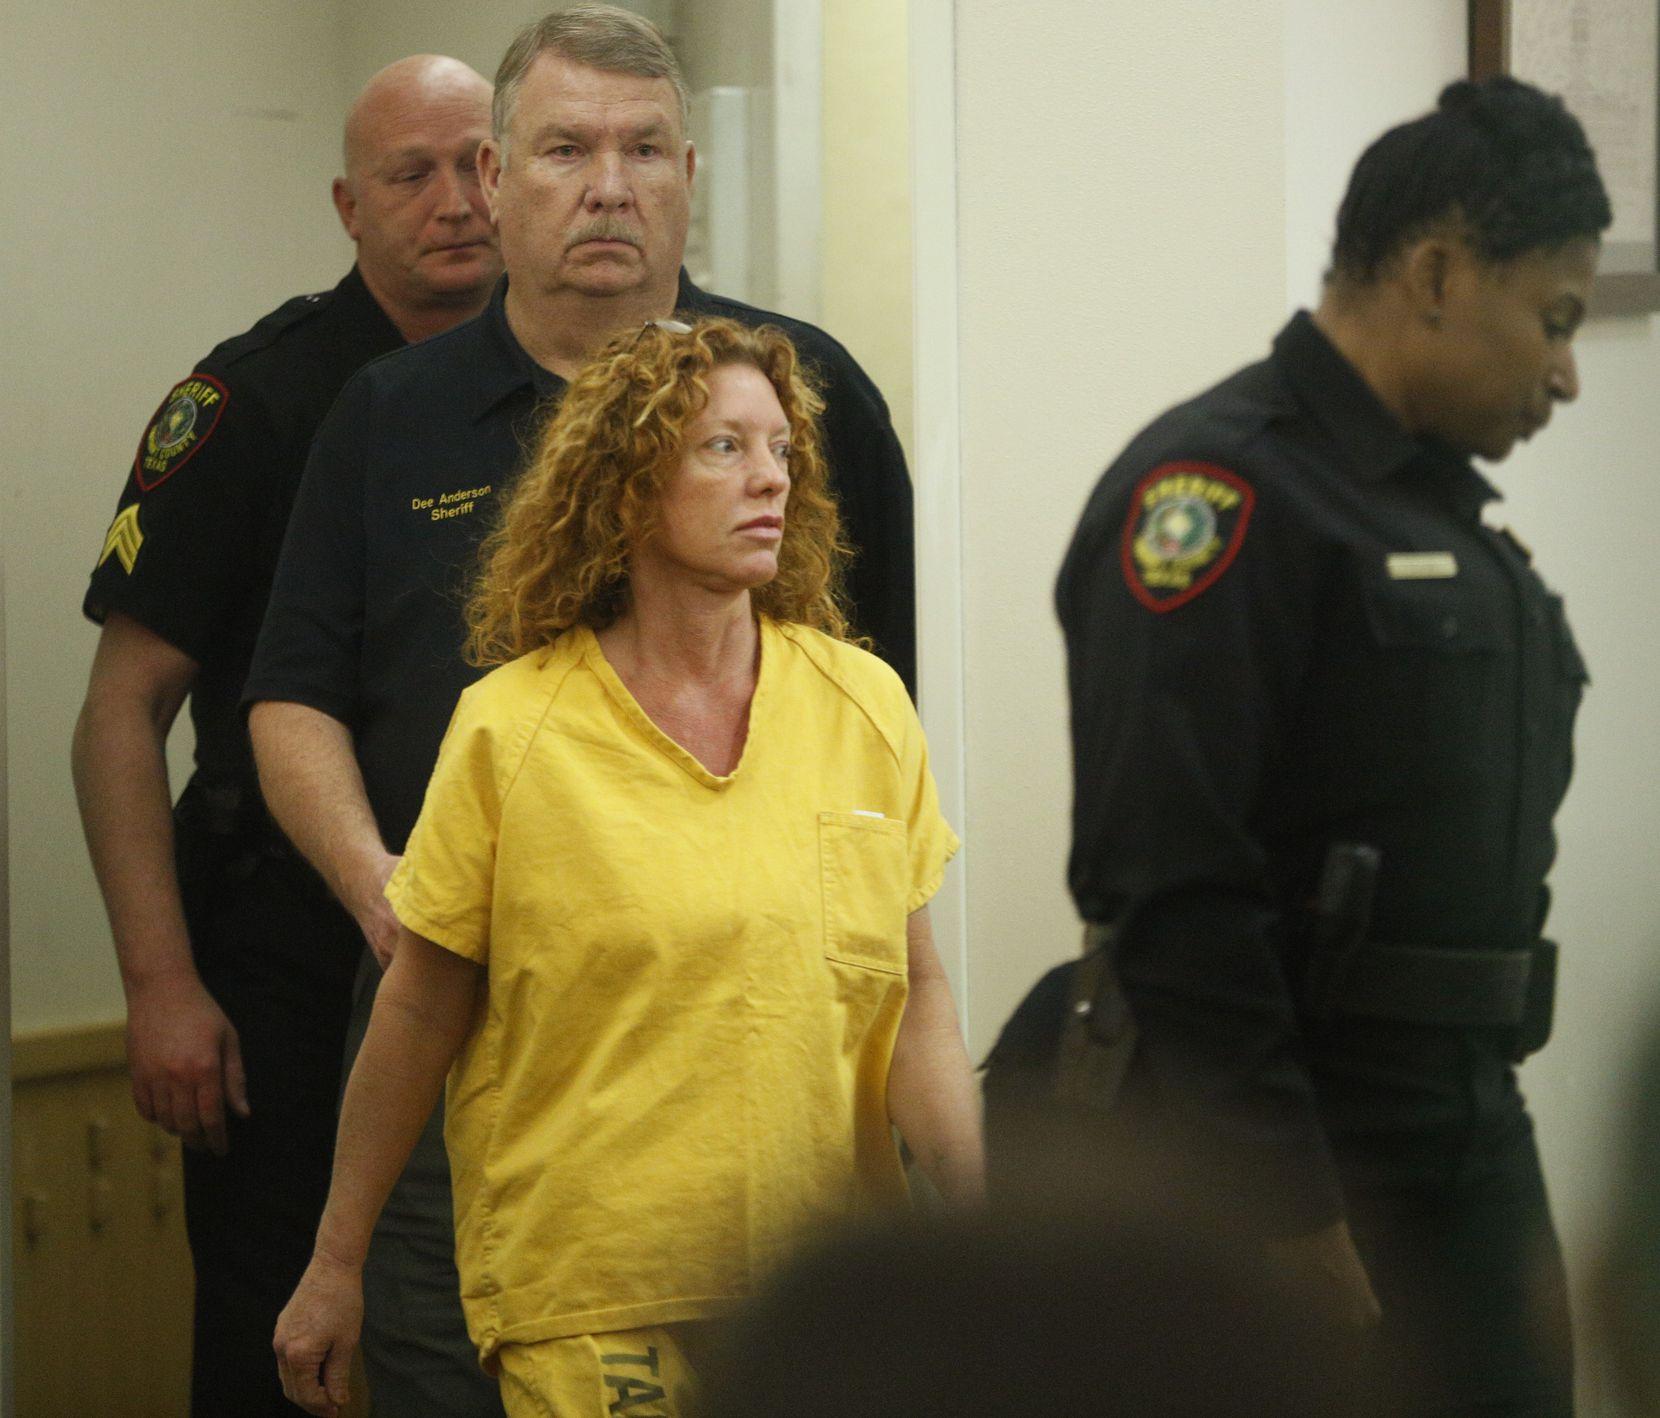 Tonya Couch walks into her arraignment by Judge Wayne Salvant on Jan. 8, 2016.